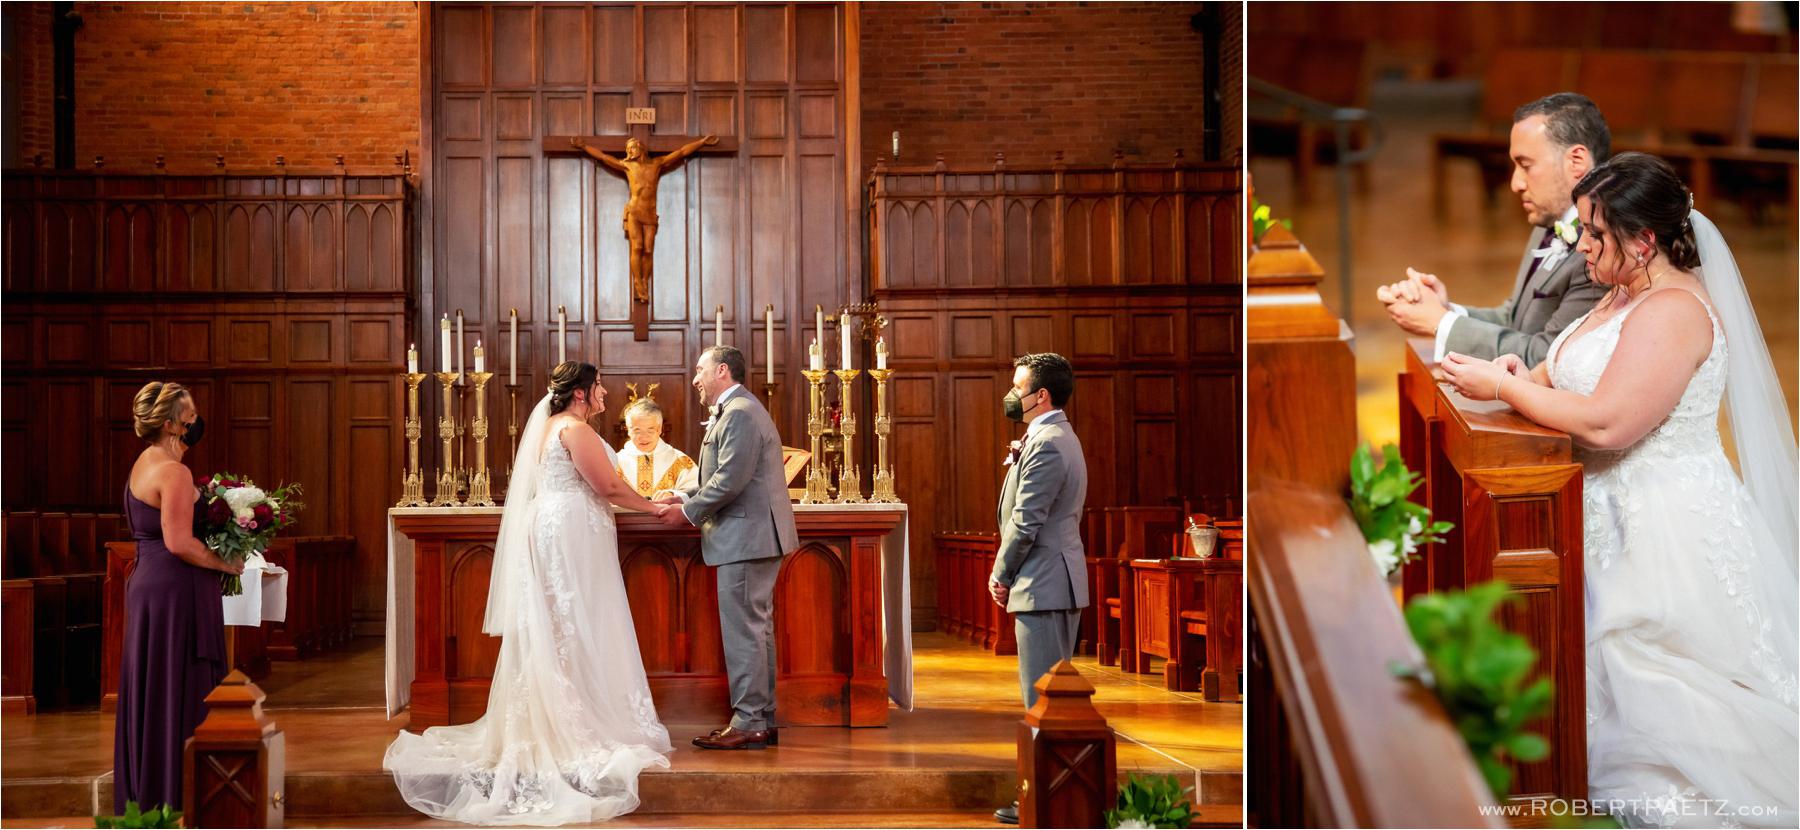 Blessed, Sacrament, Catholic, Church, rays, boat, house, wedding, reception, seattle, ballard, pnw, photography, photographer, destination